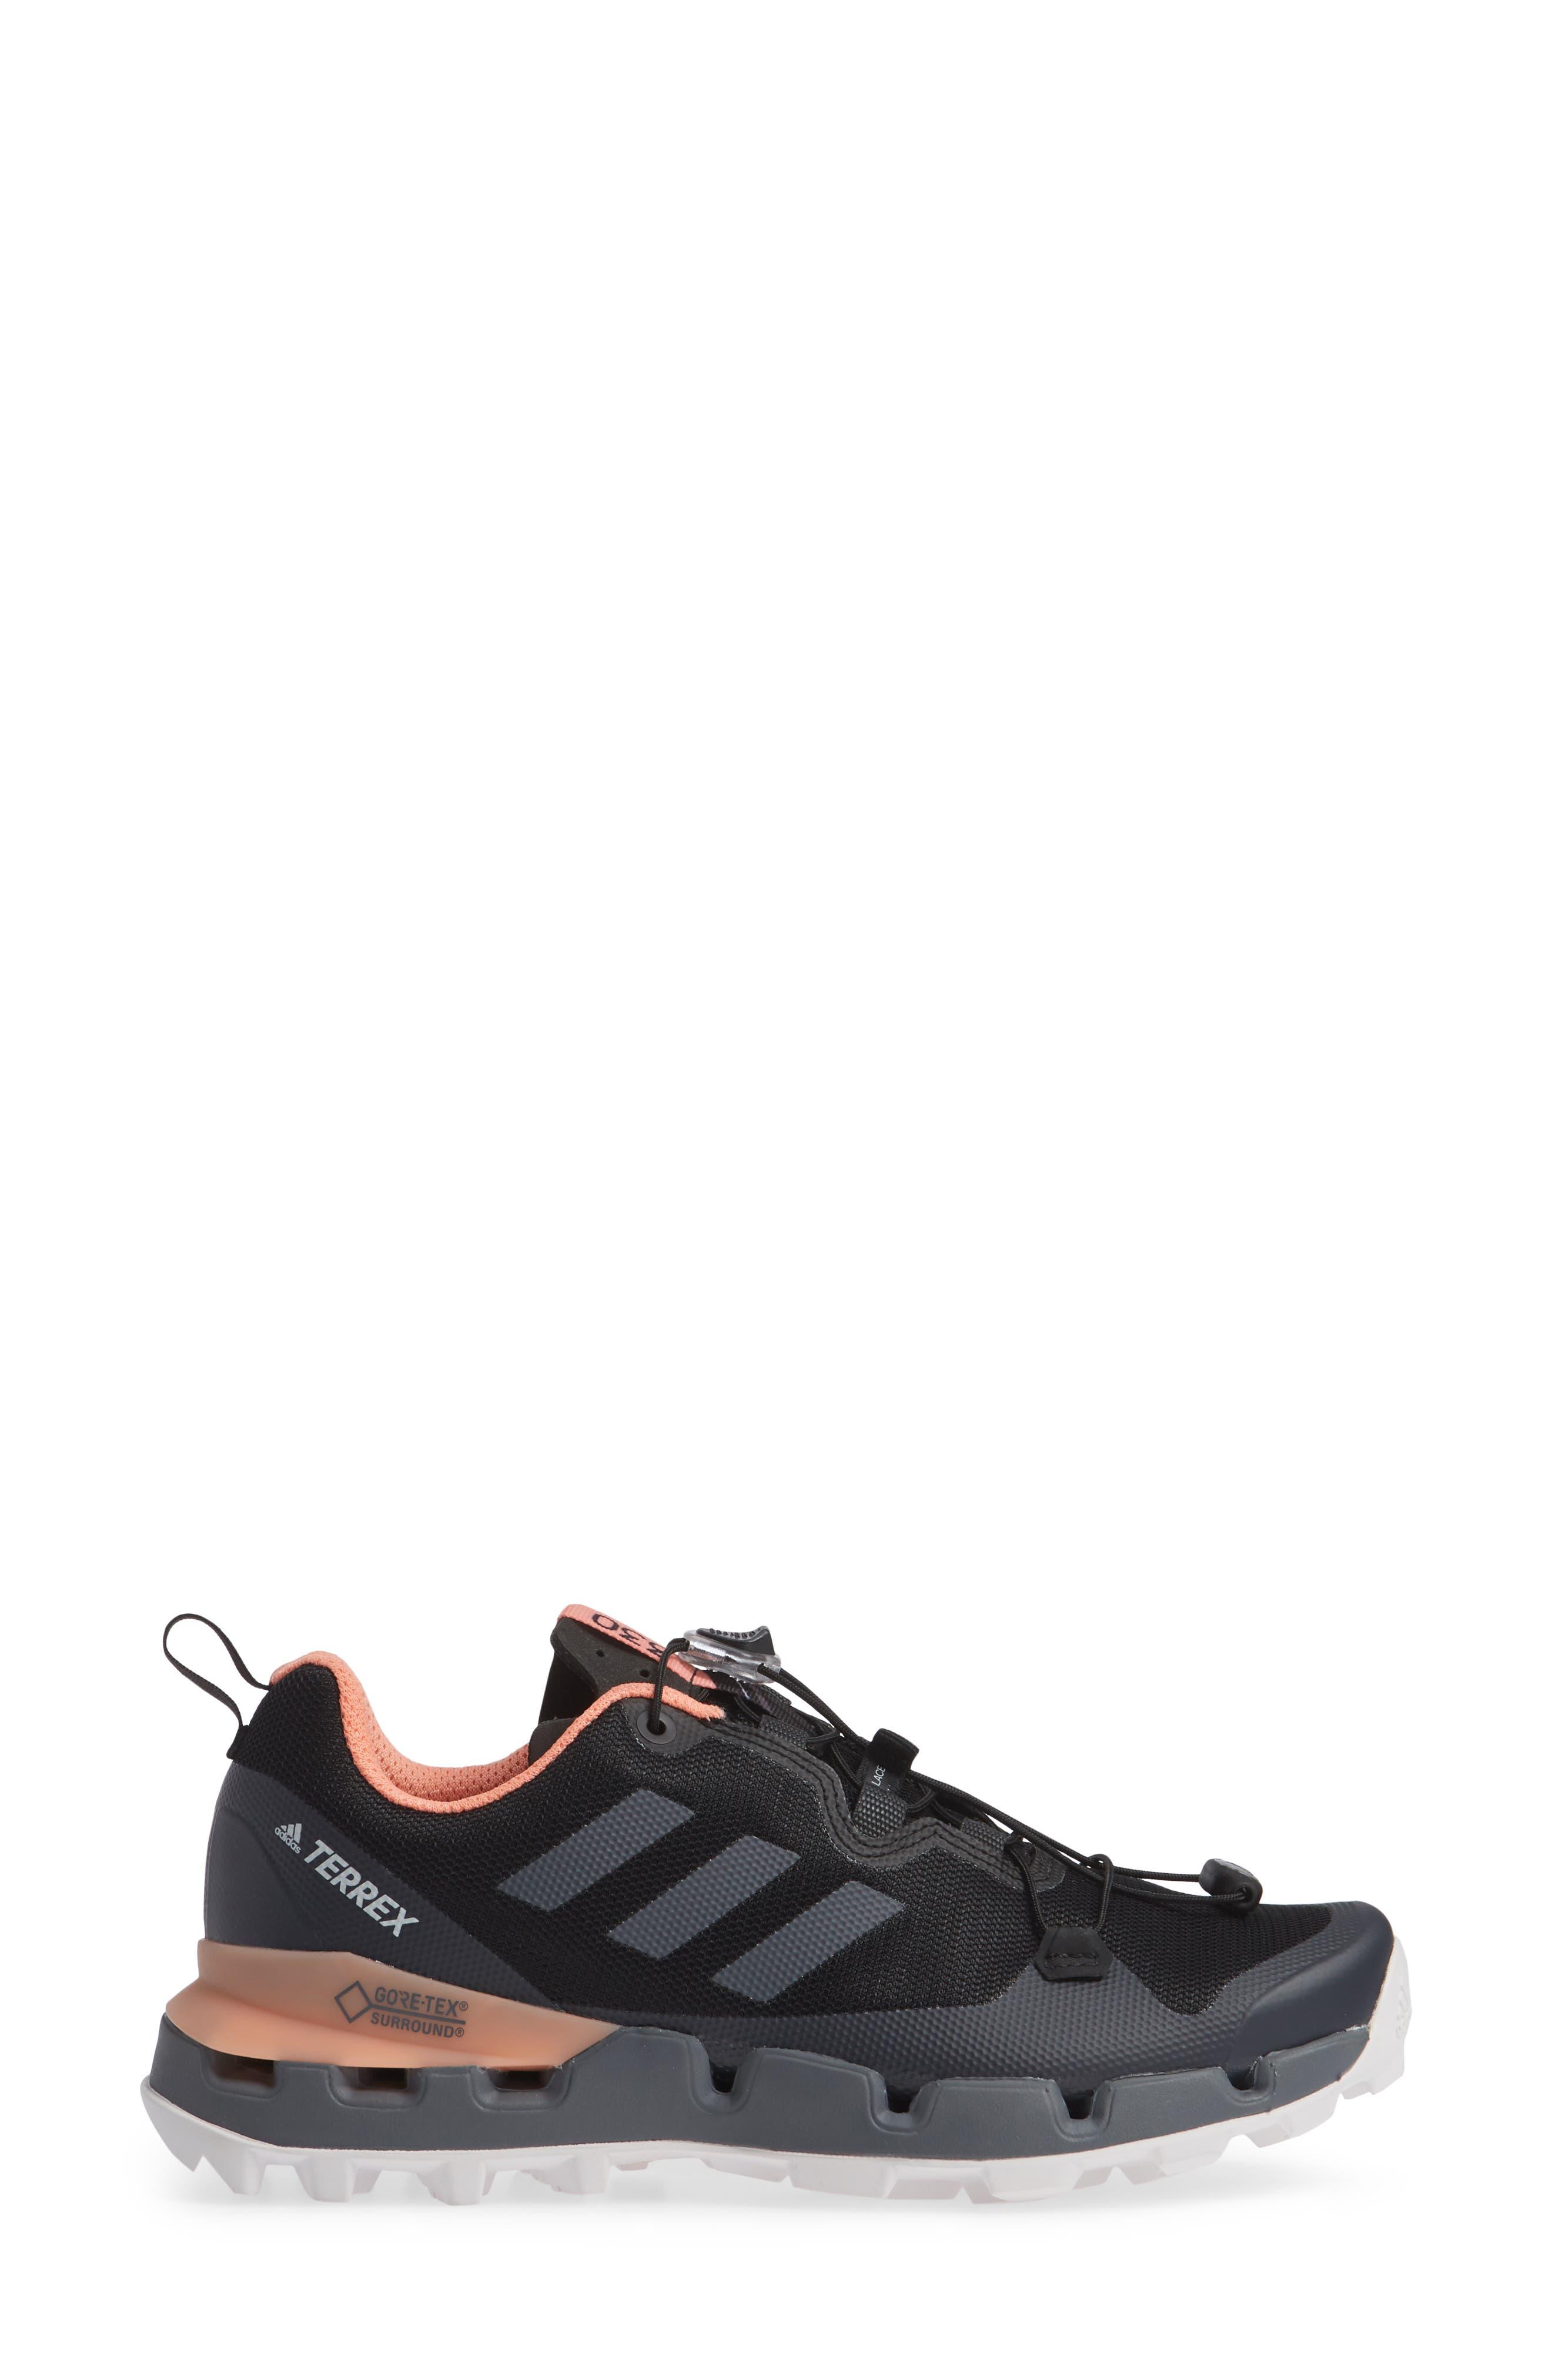 Terrex Fast GTX<sup>®</sup> Surround Hiking Shoe,                             Alternate thumbnail 3, color,                             BLACK/ GREY FIVE/ CHALK CORAL